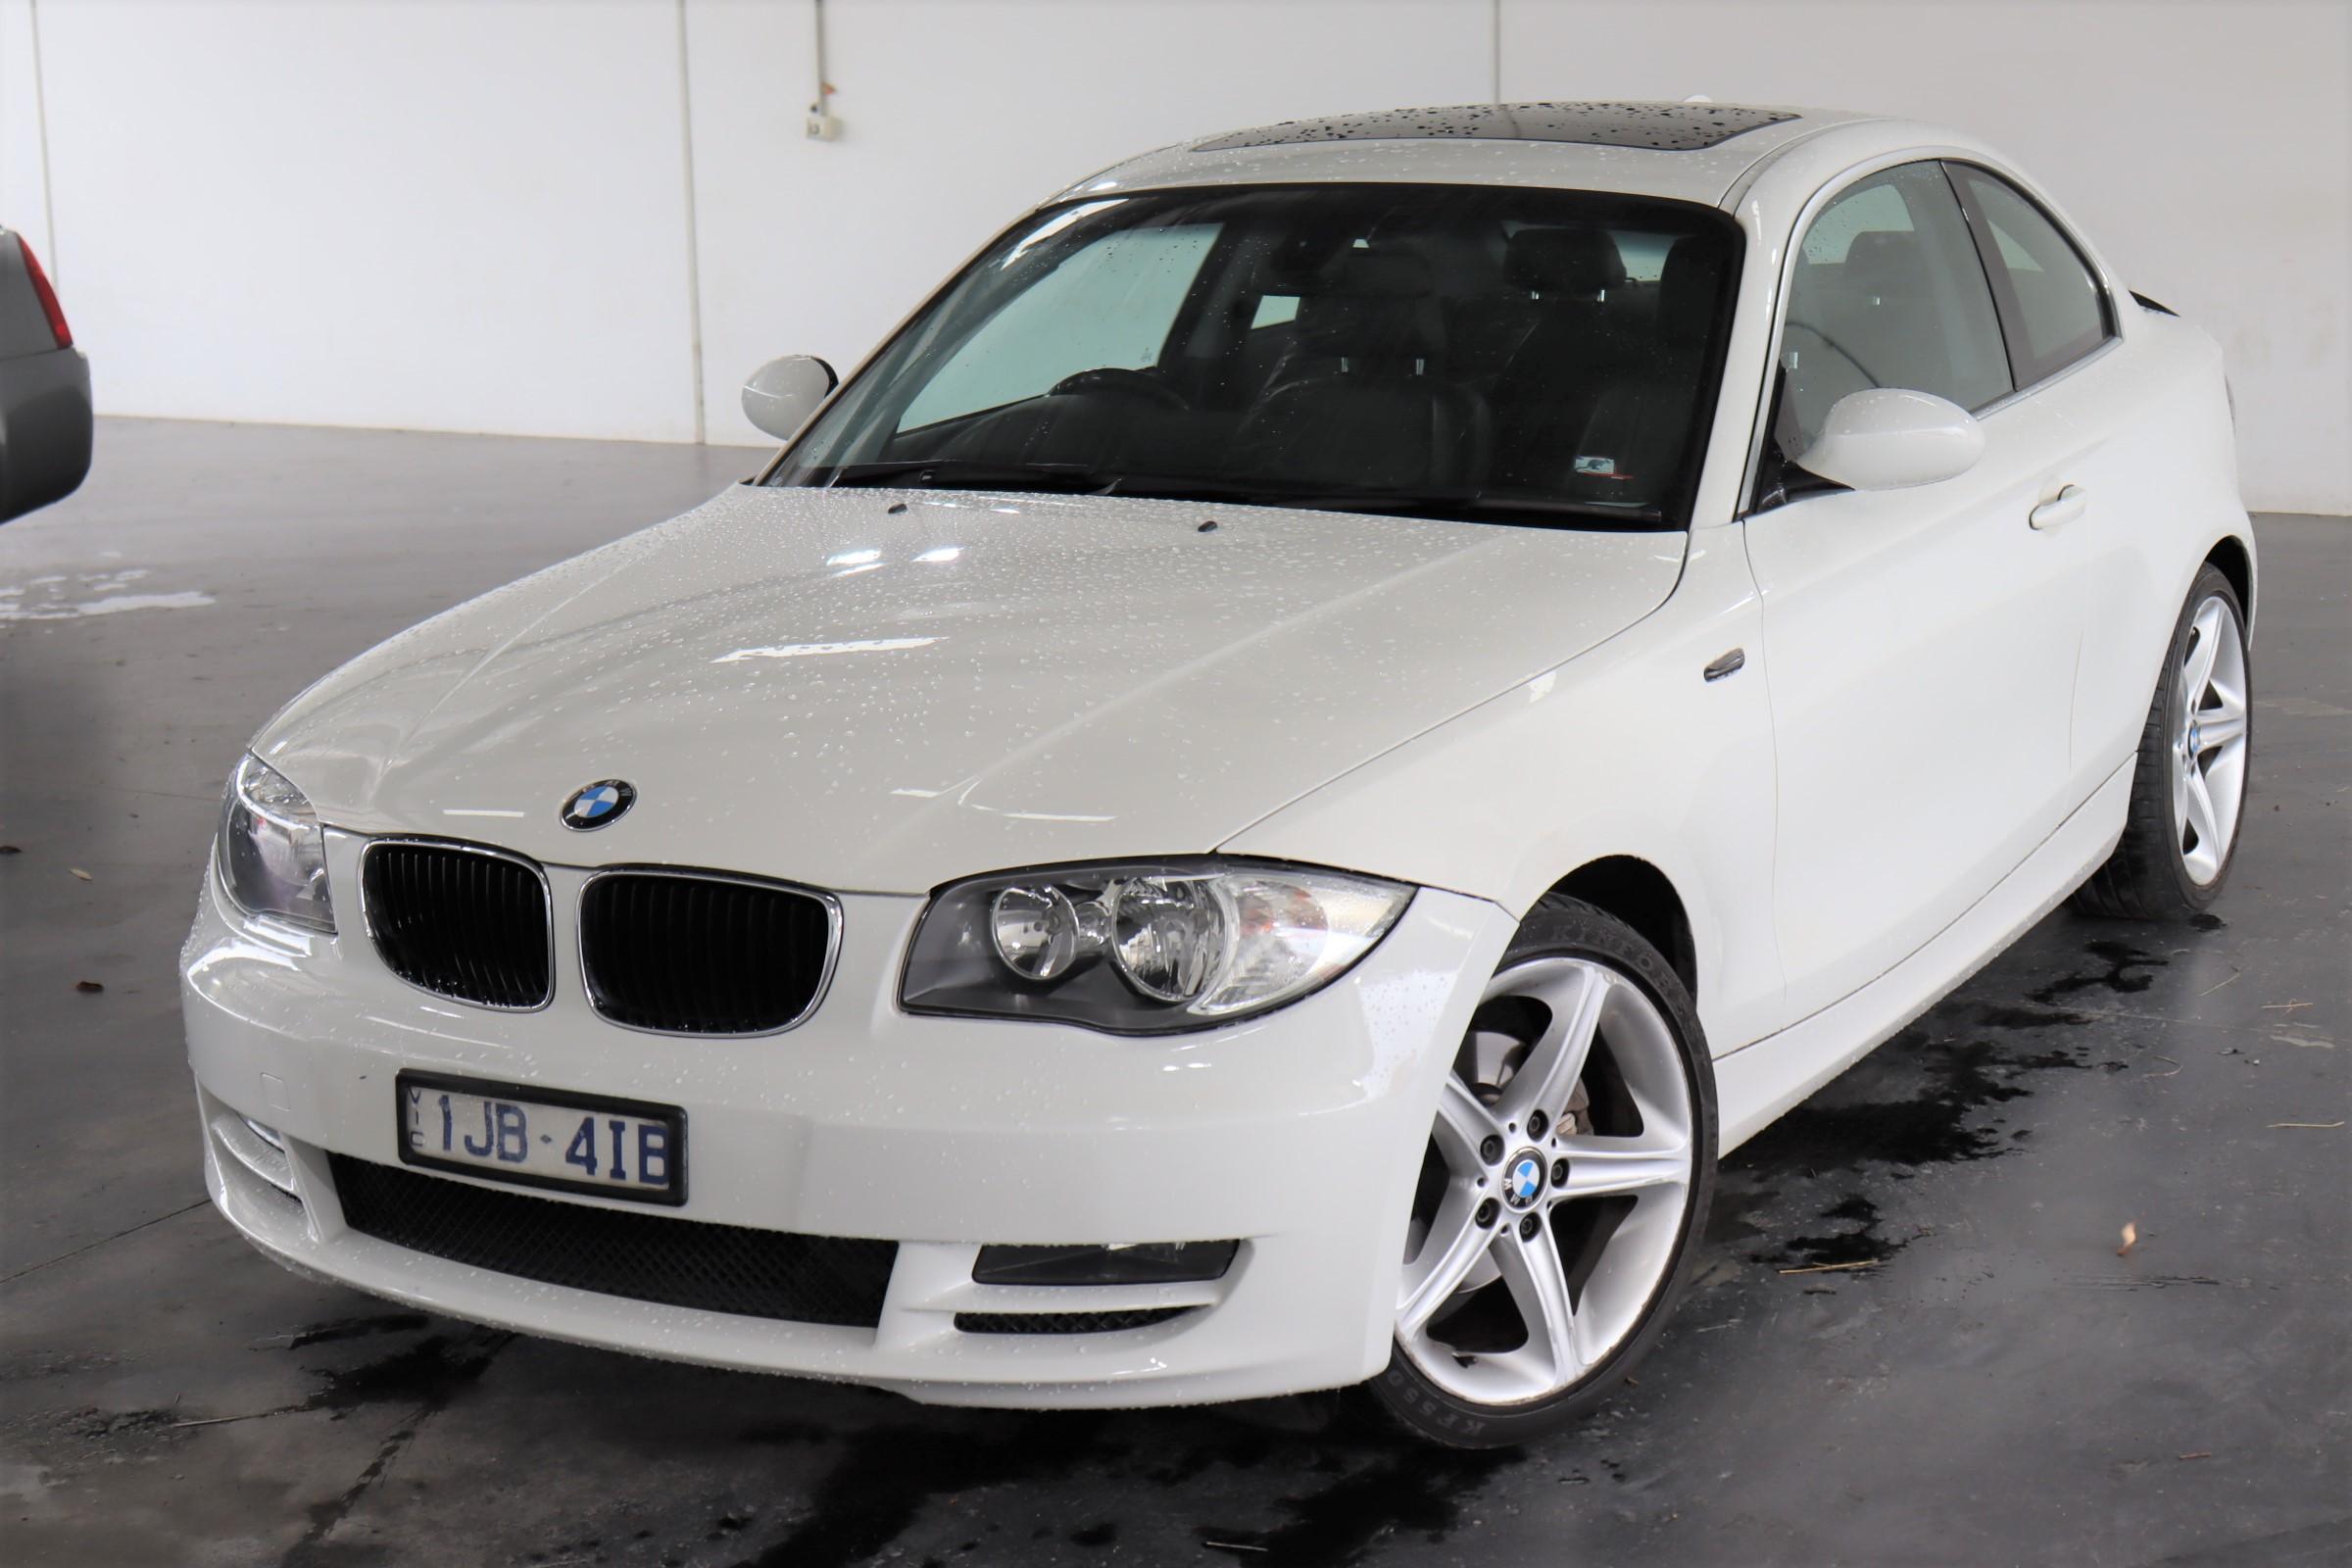 2009 BMW 1 25i E82 Automatic Coupe